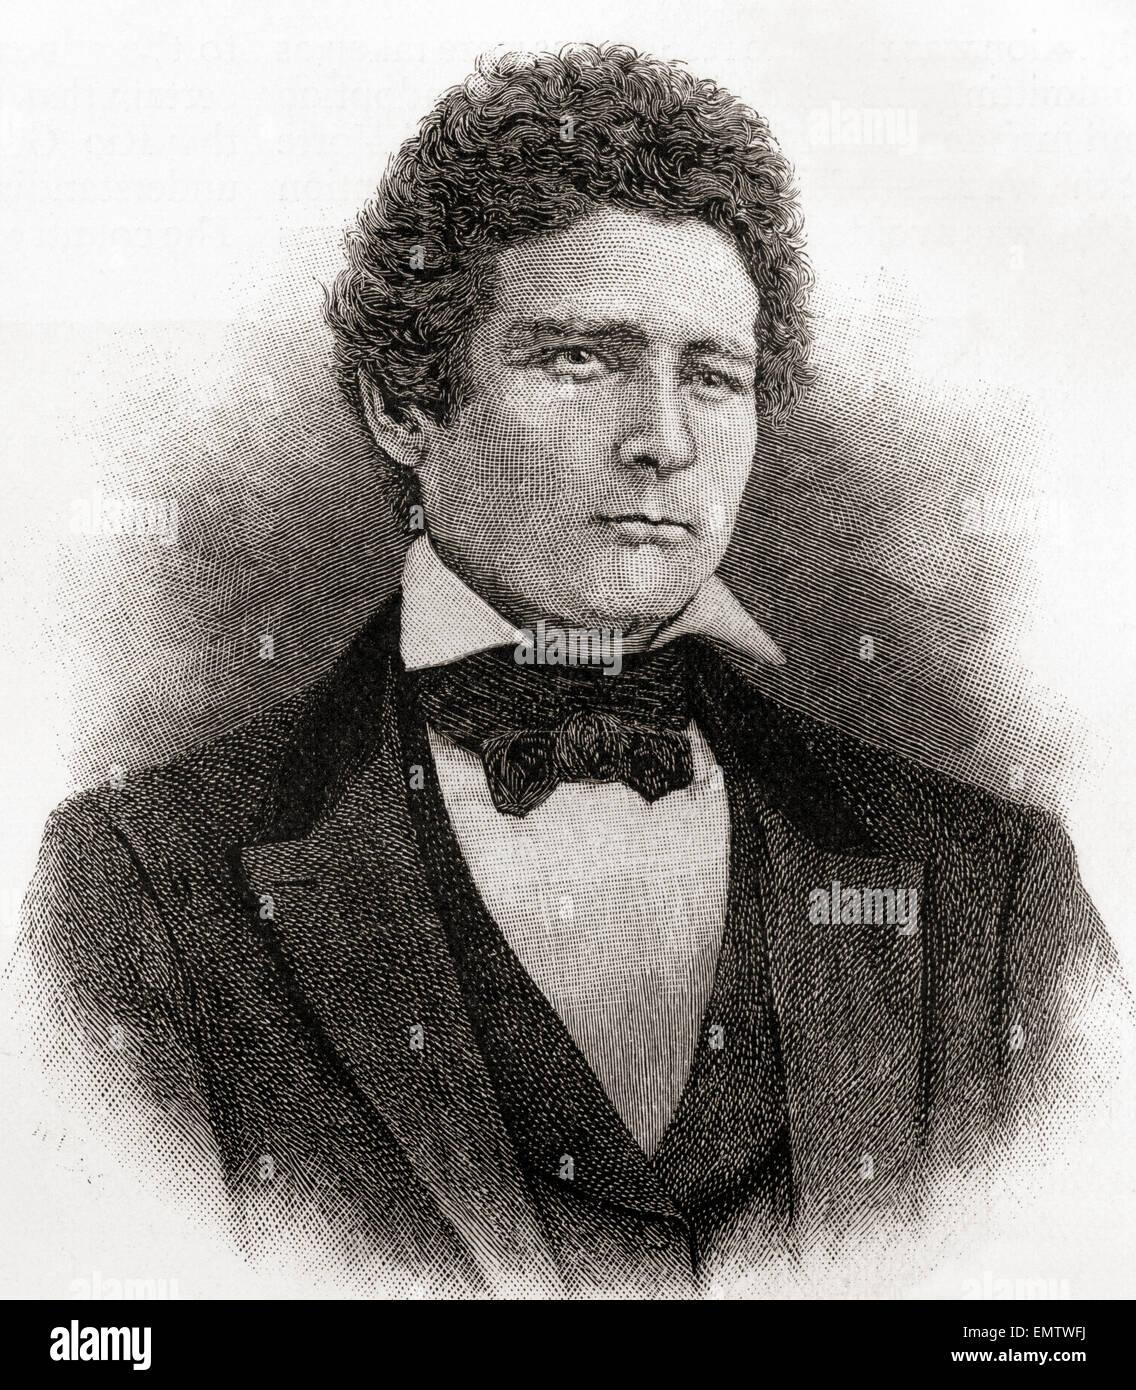 John J. Hardin, 1810 – 1847.   U.S. Representative and militia general from Illinois. - Stock Image